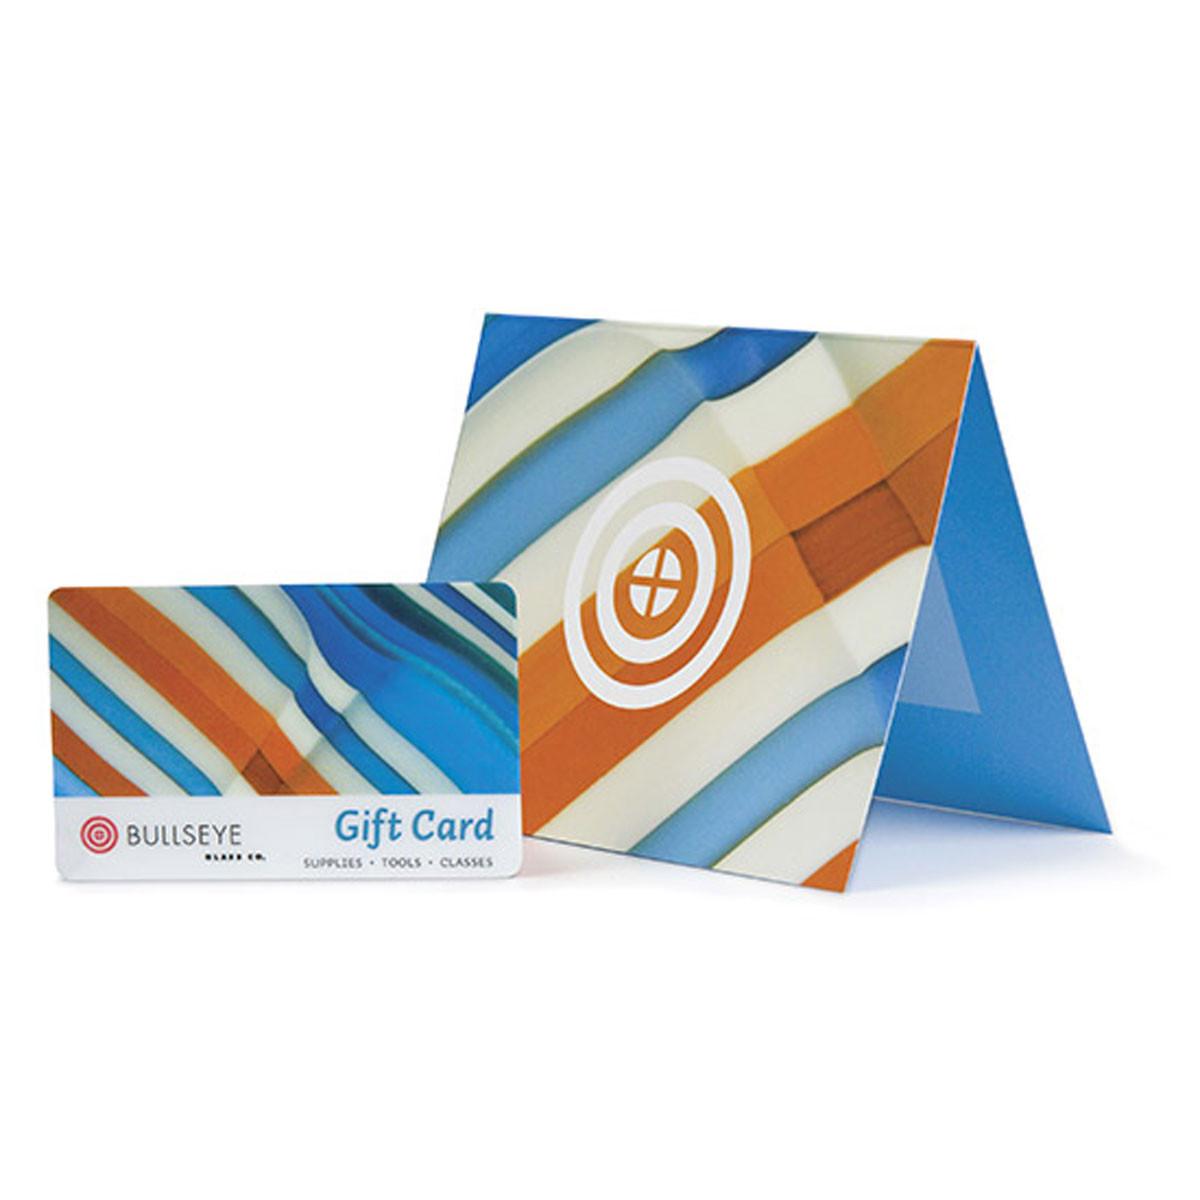 Bullseye Gift Card